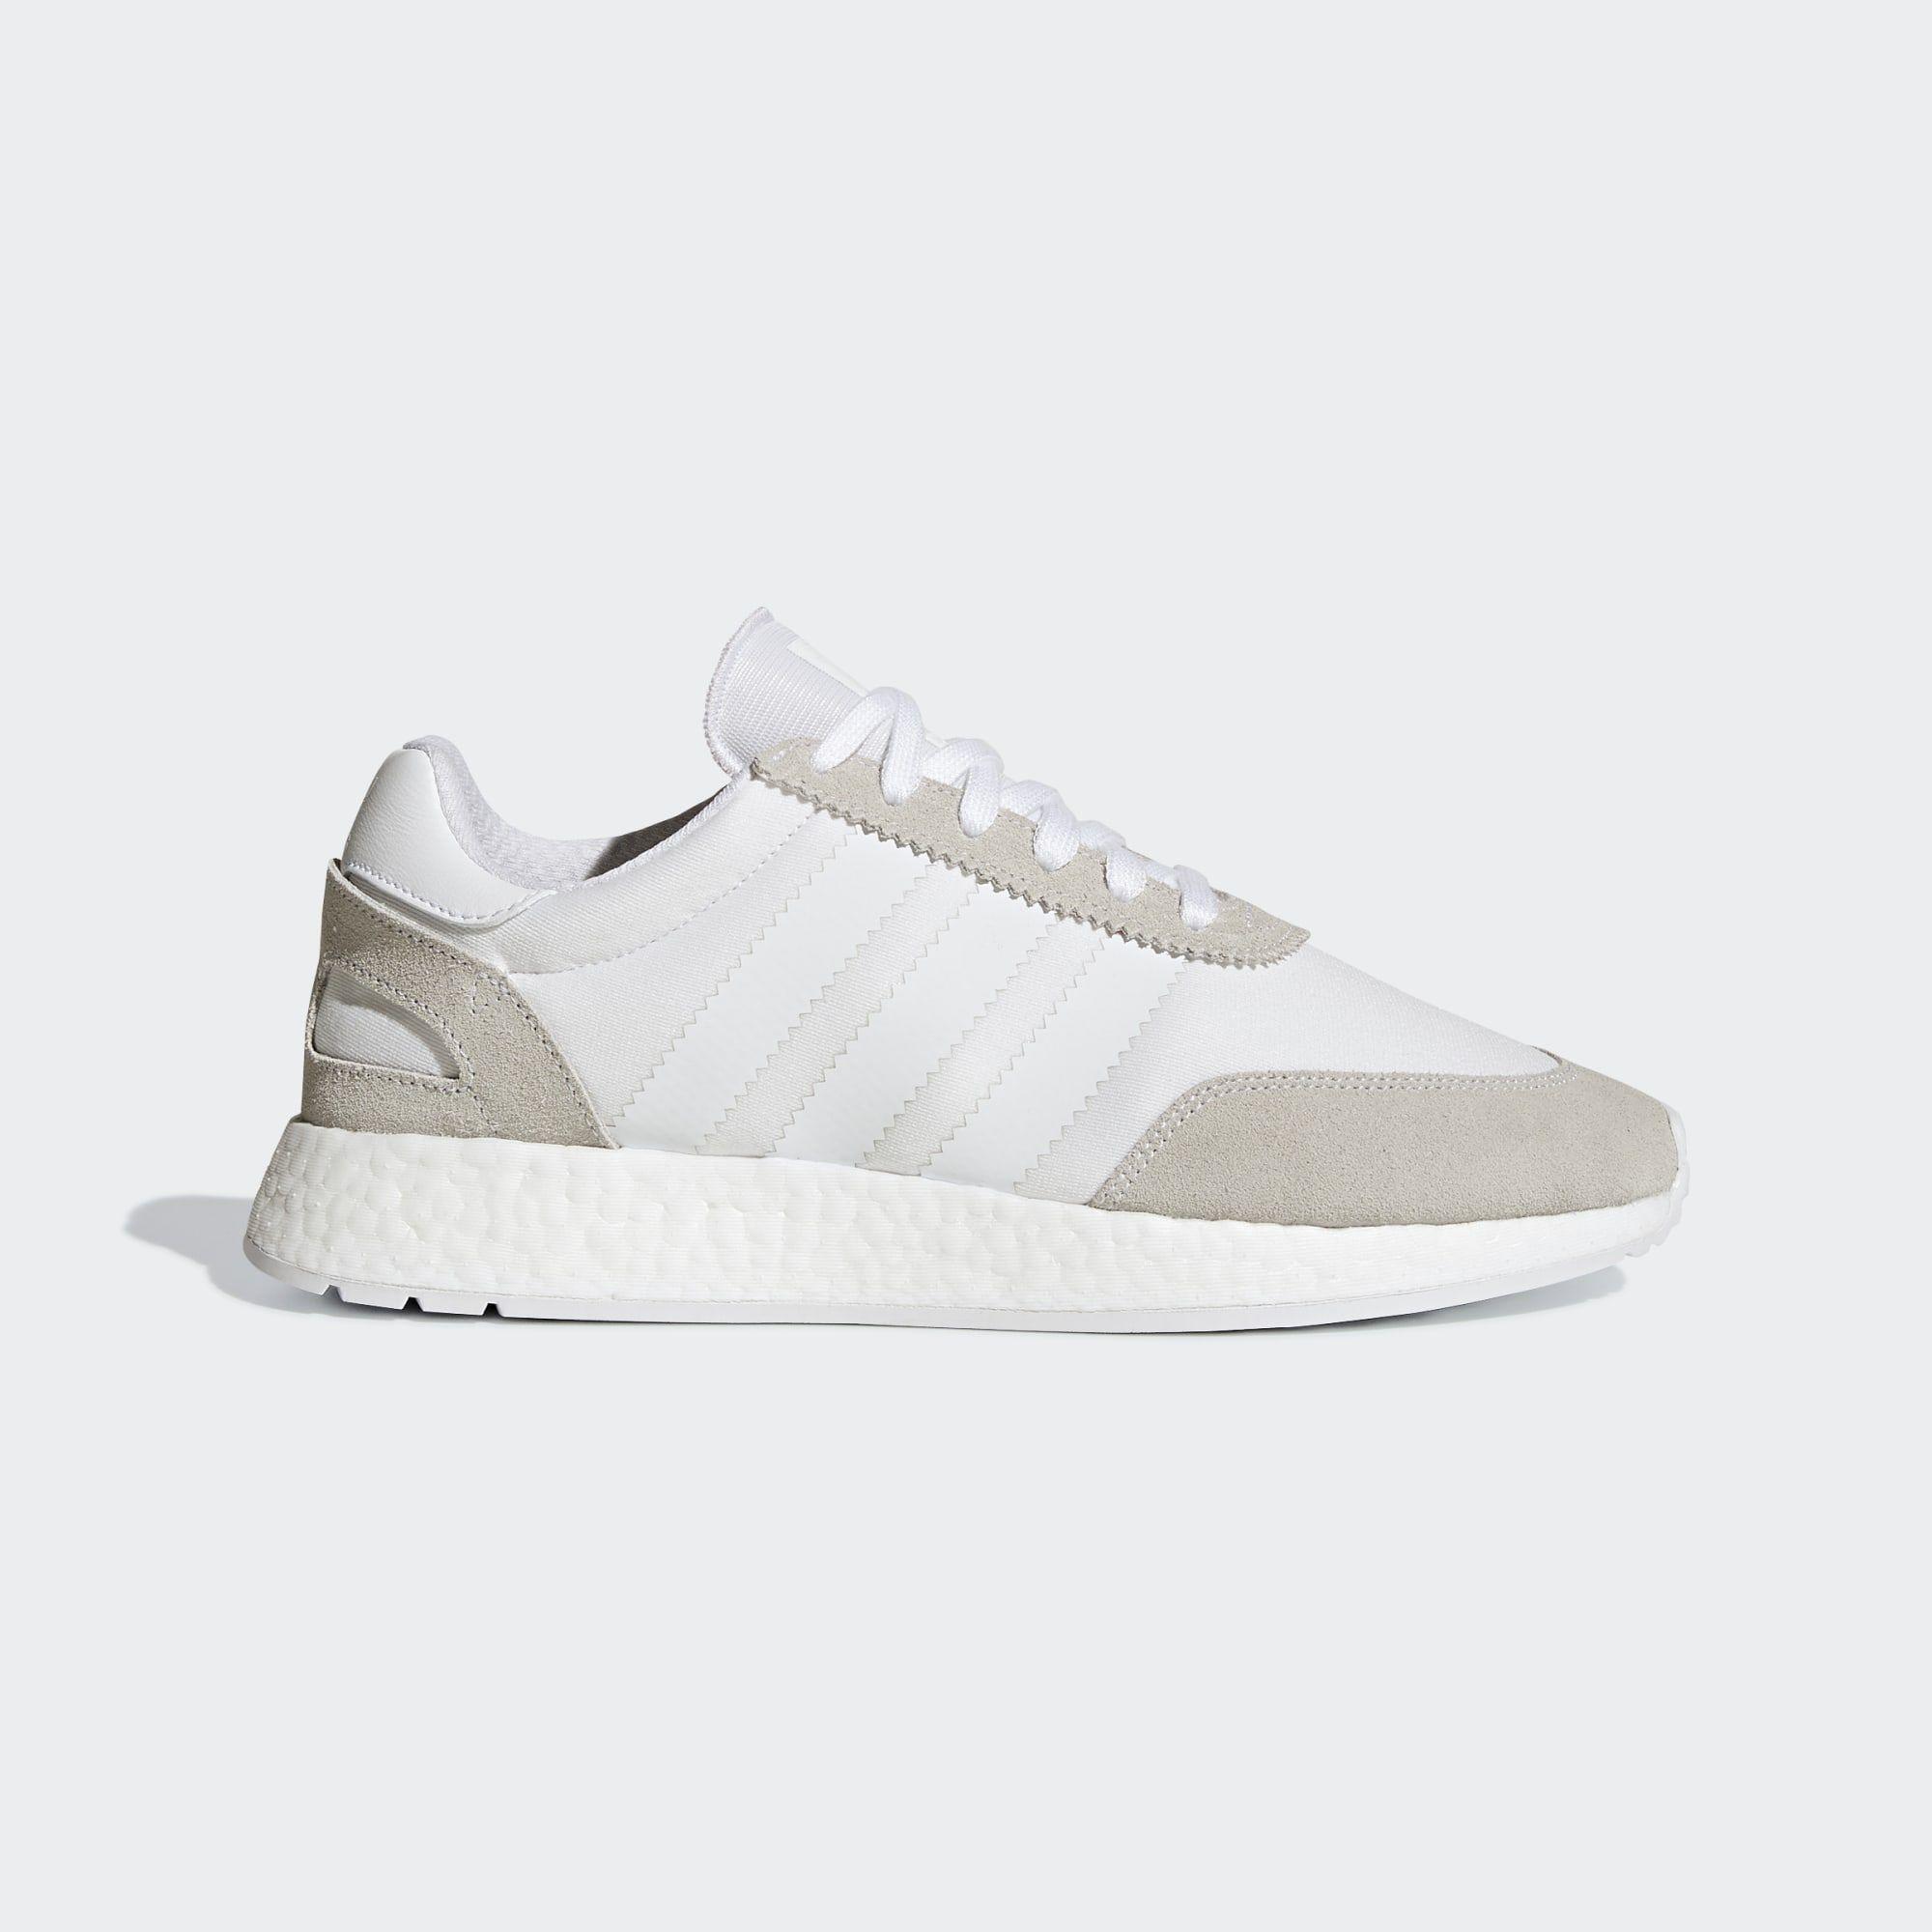 Adidas I-5923 Shoes - Ftwr White / Ftwr White / Ftwr White ...